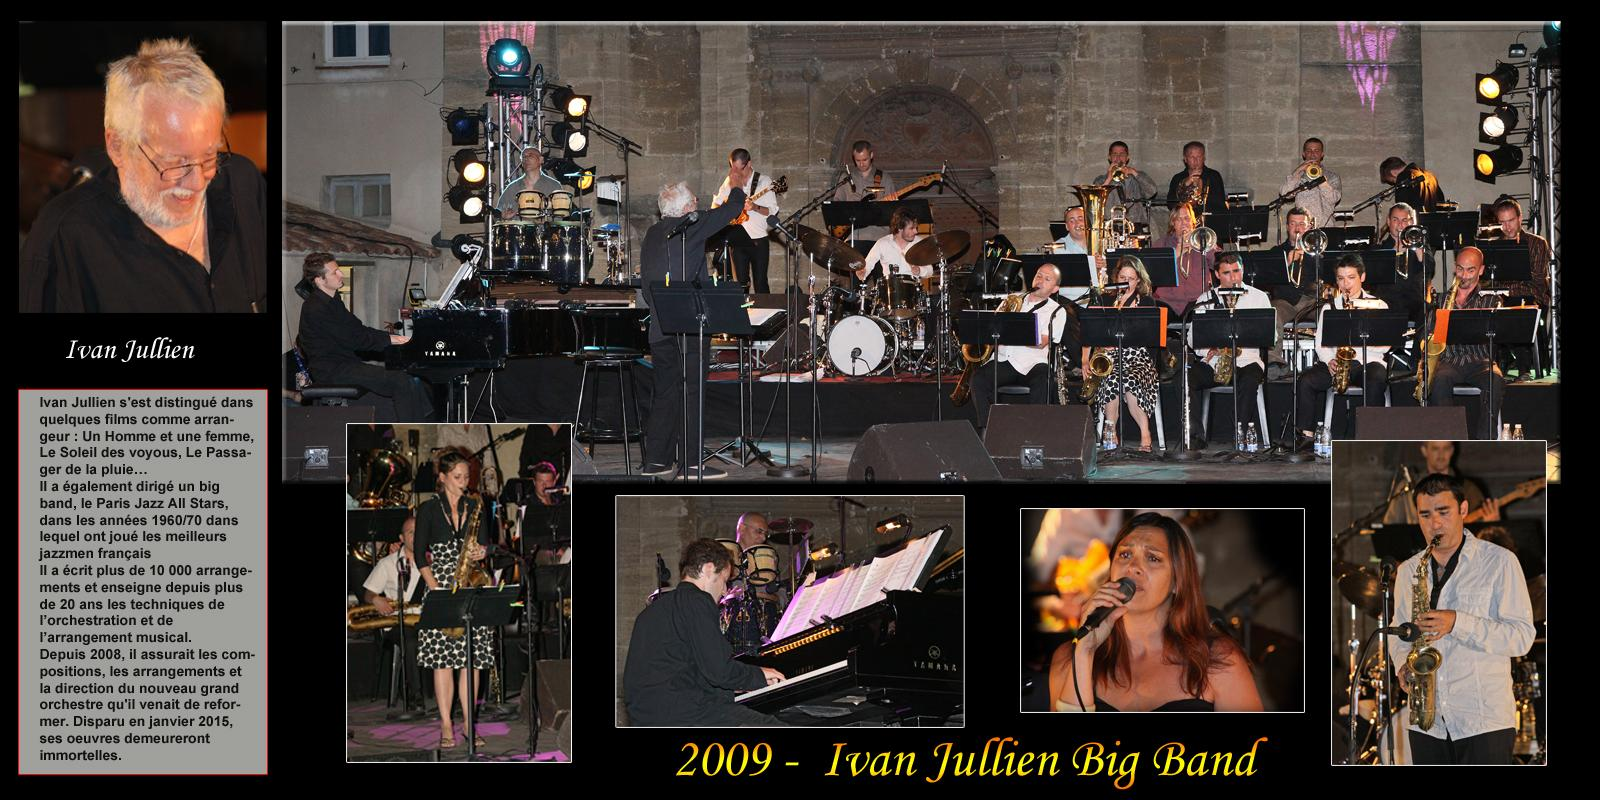 2009-IvanJullien Big Band